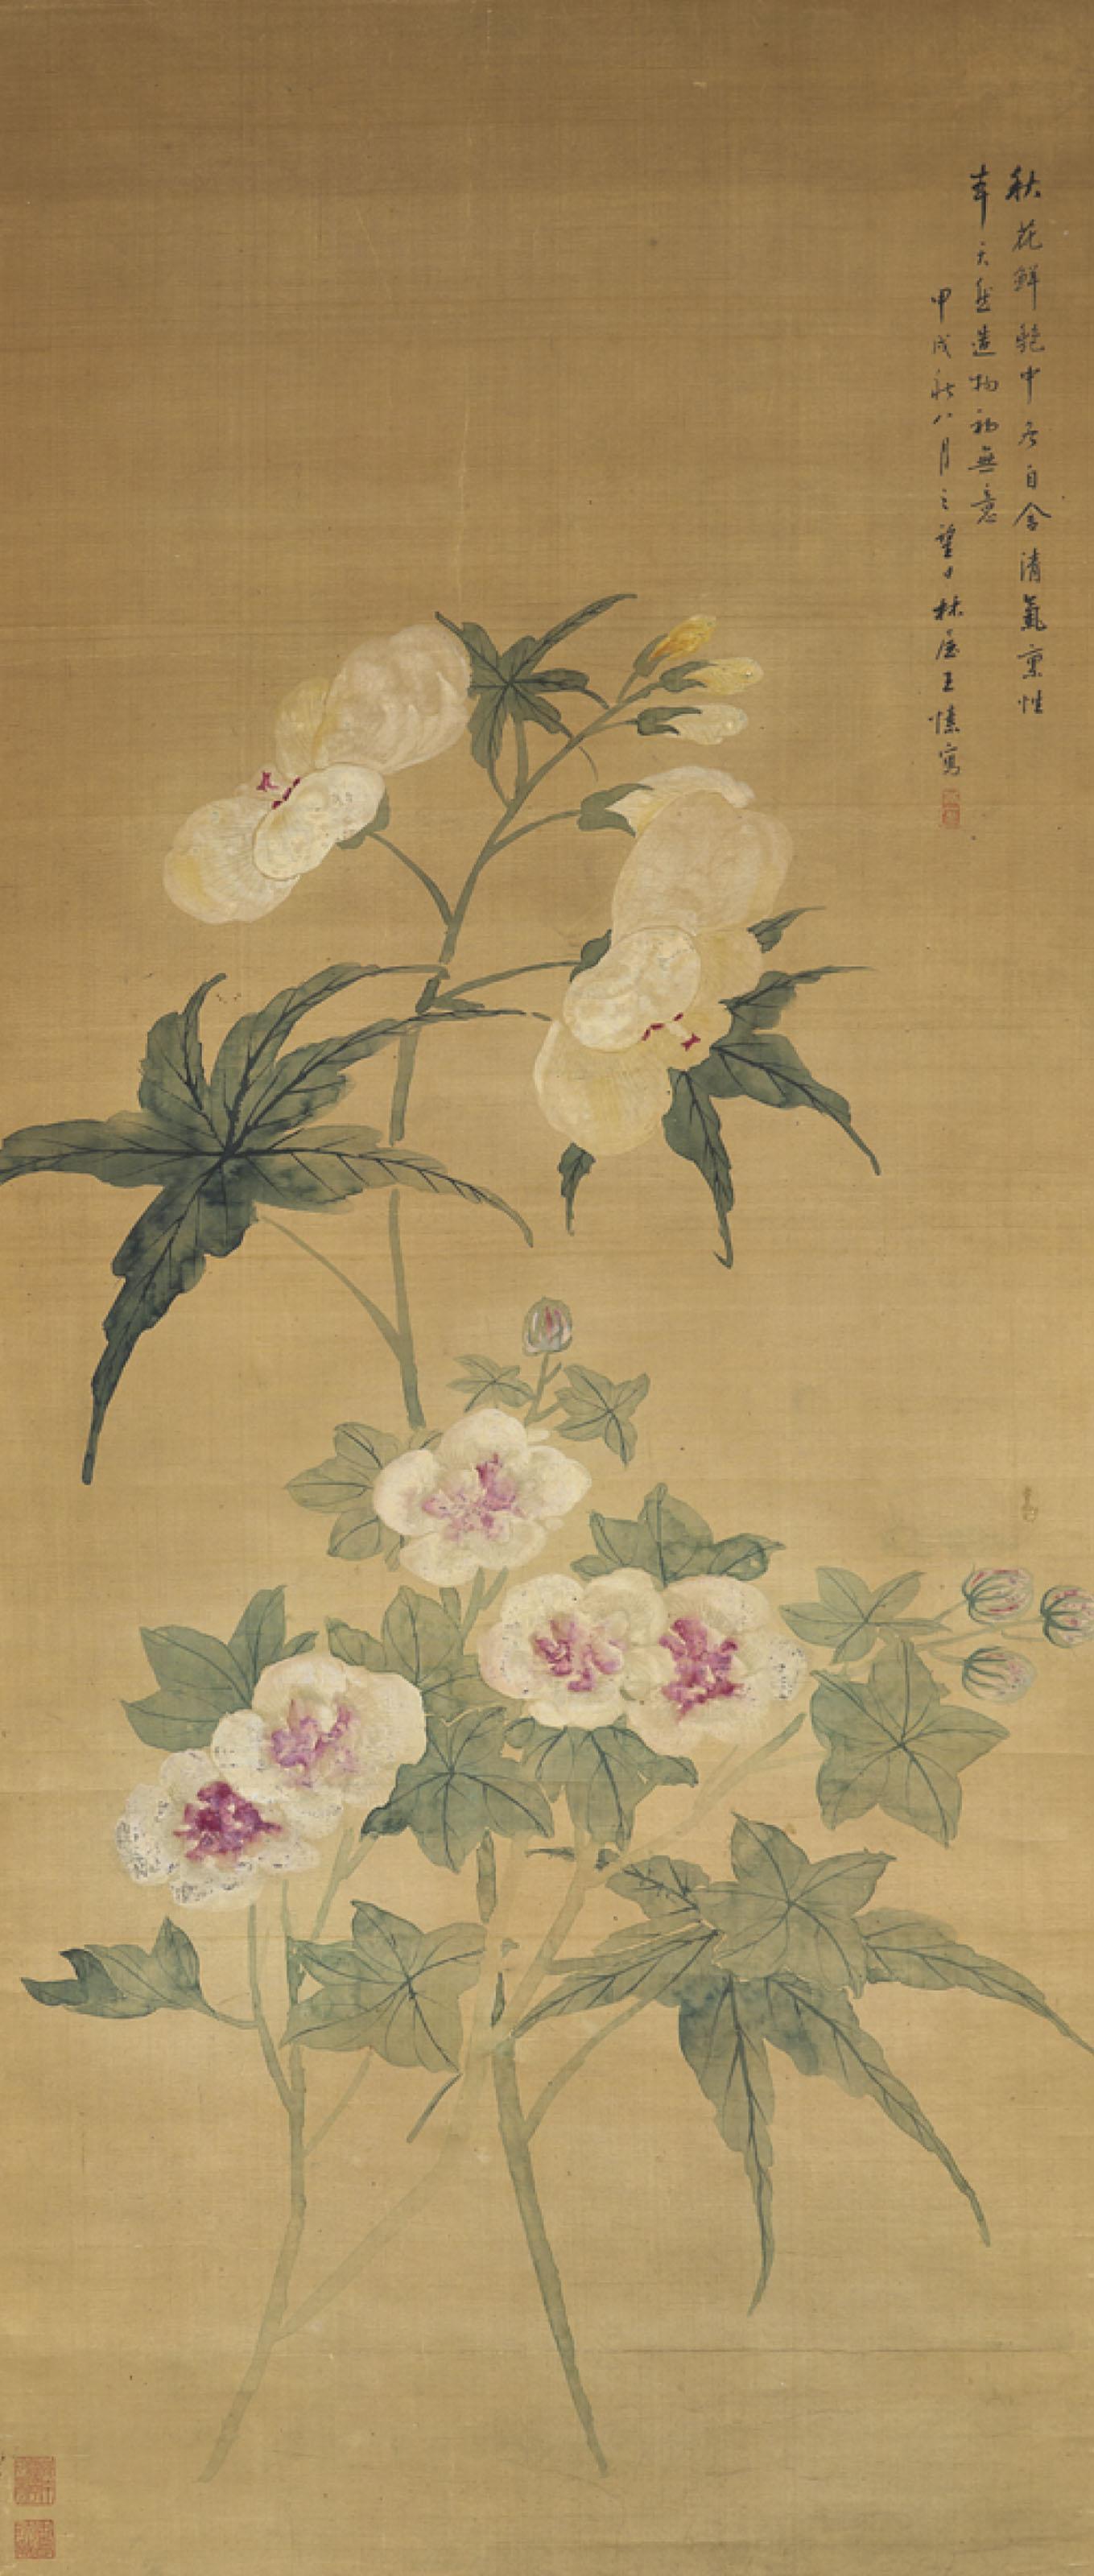 WANG SU (18TH CENTURY)